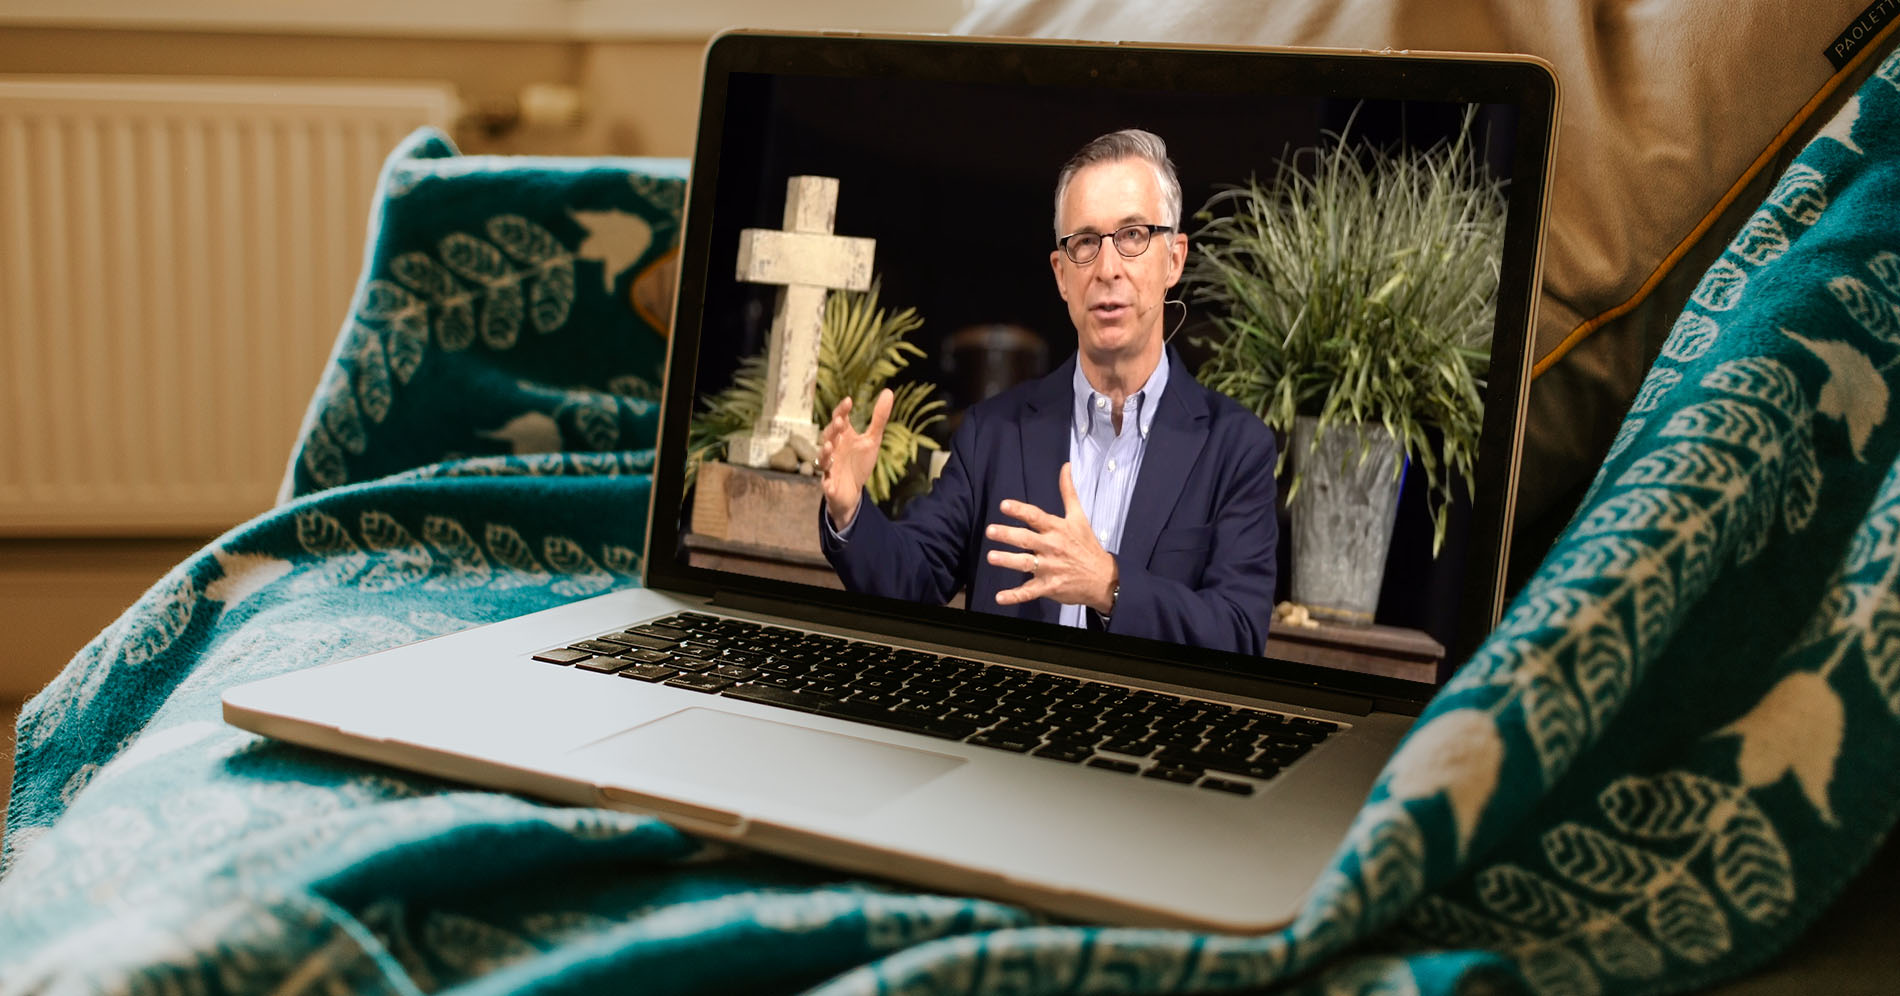 Christ Church Birmingham Online Worship | November 8, 2020